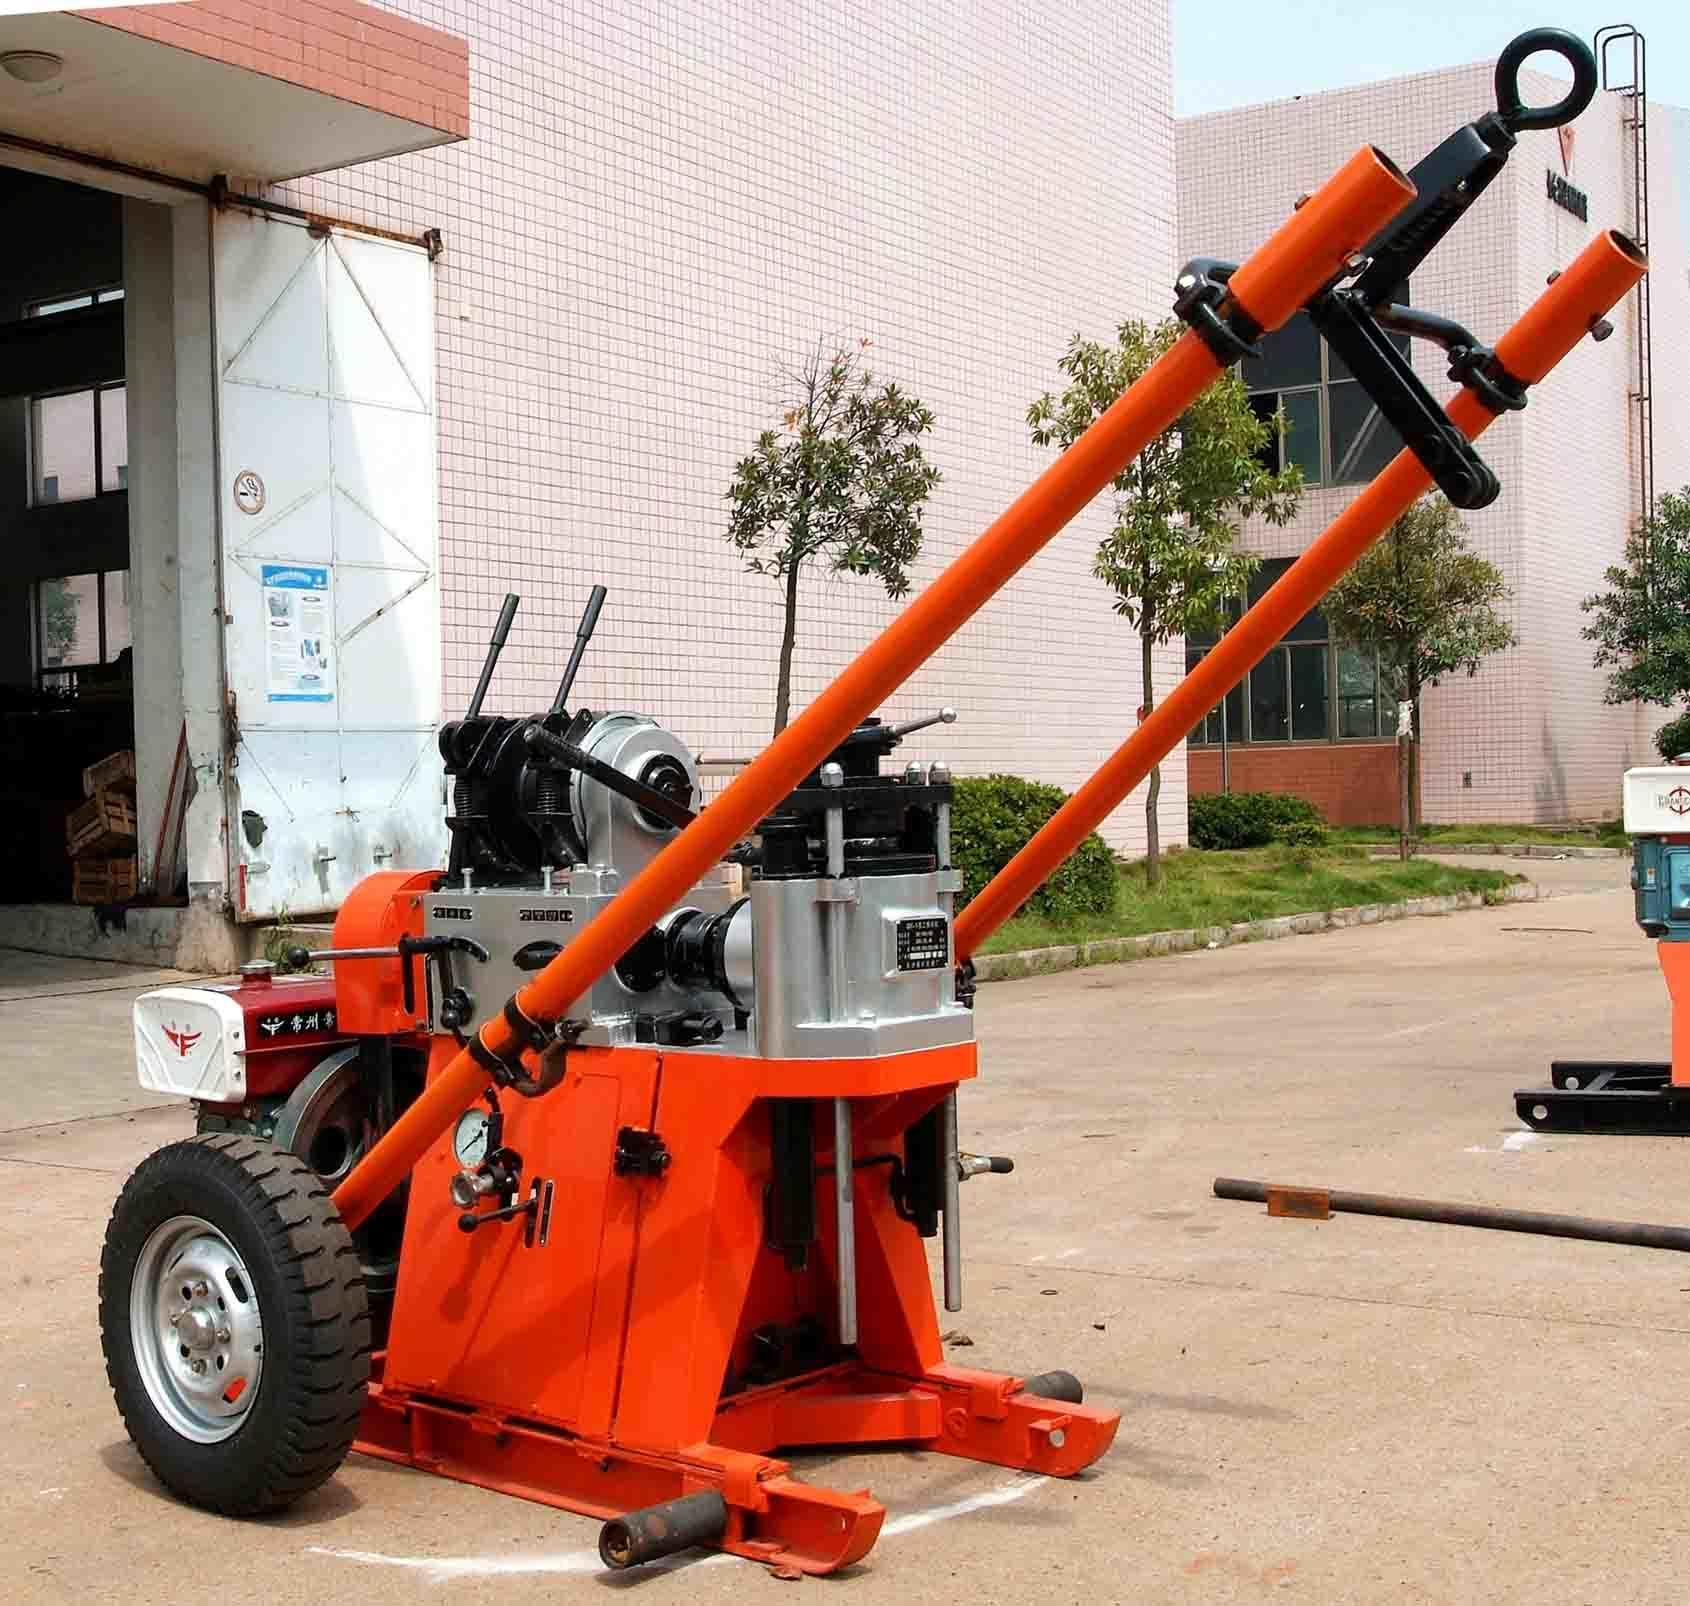 Engineering Geological Exploration Drilling Rig Rh-100